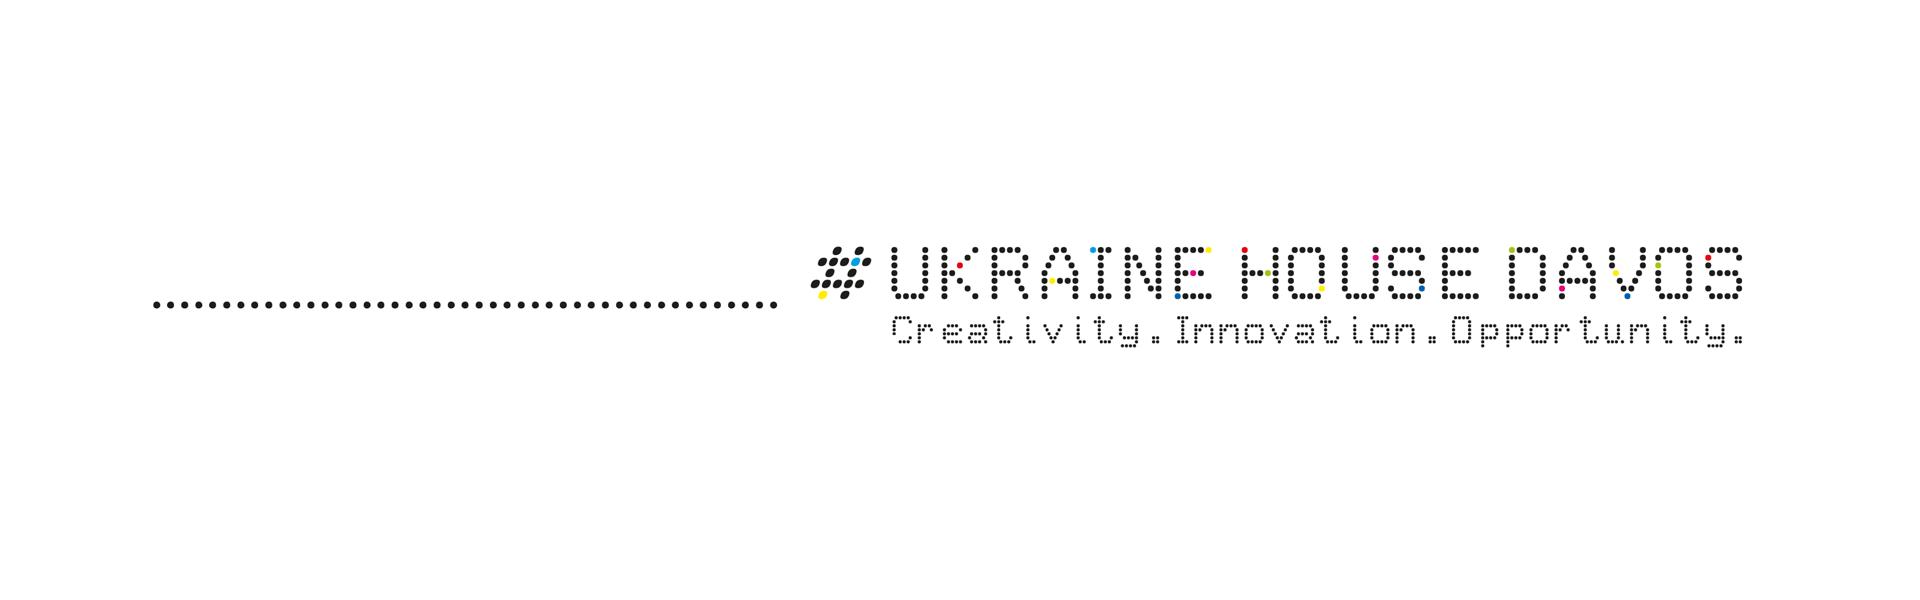 ukraine world economic forum davos